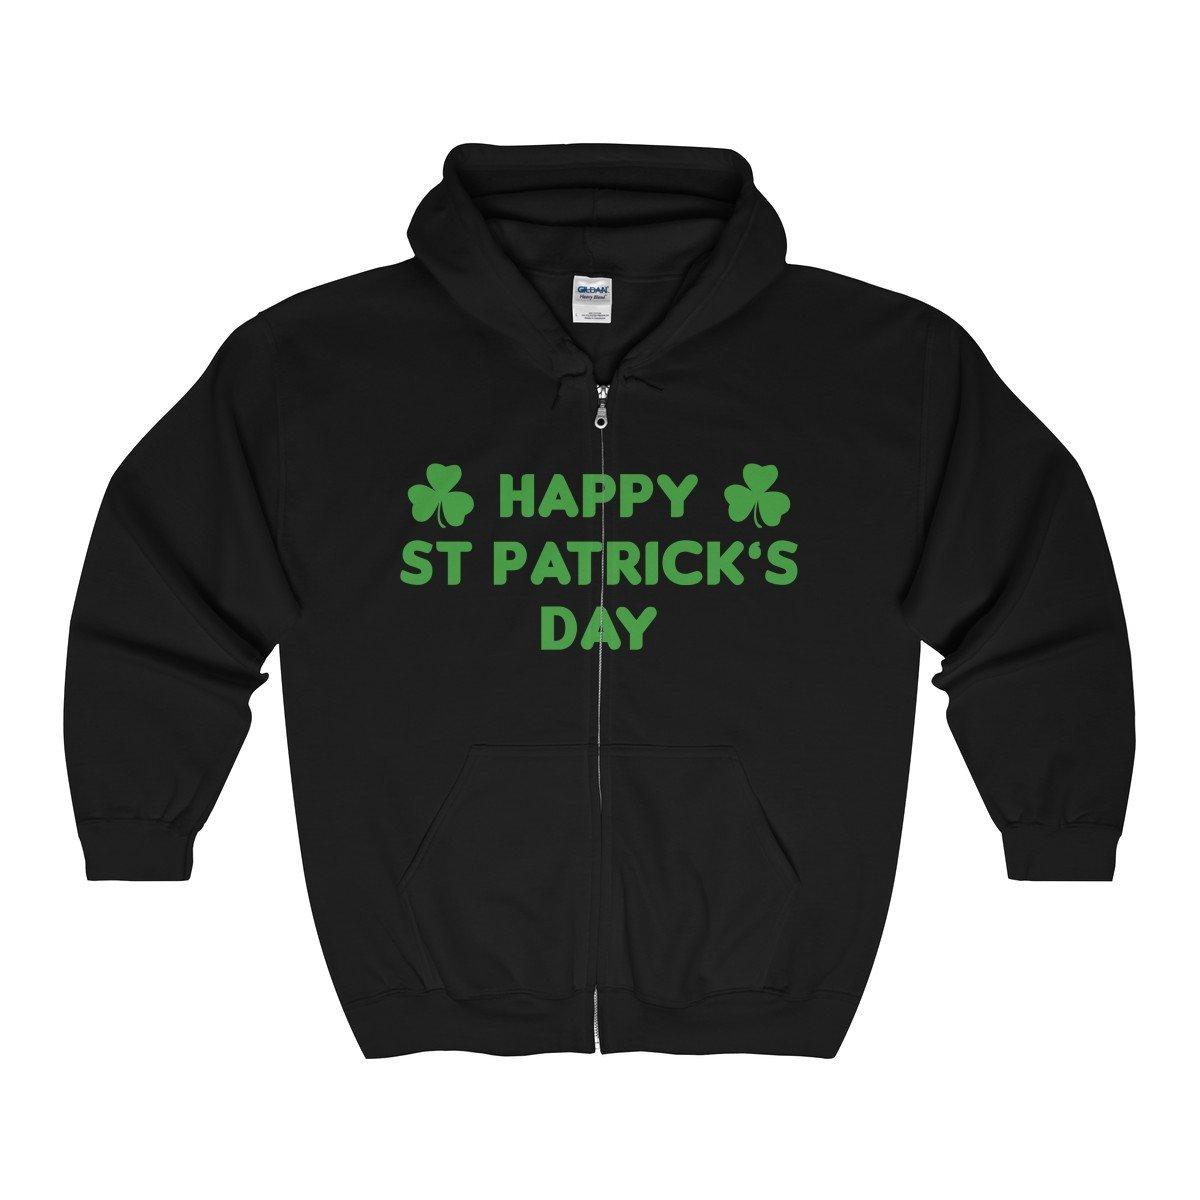 Vinteena Happy ST Patrick/_s Day Unisex Zip Hooded Sweatshirt-Tee